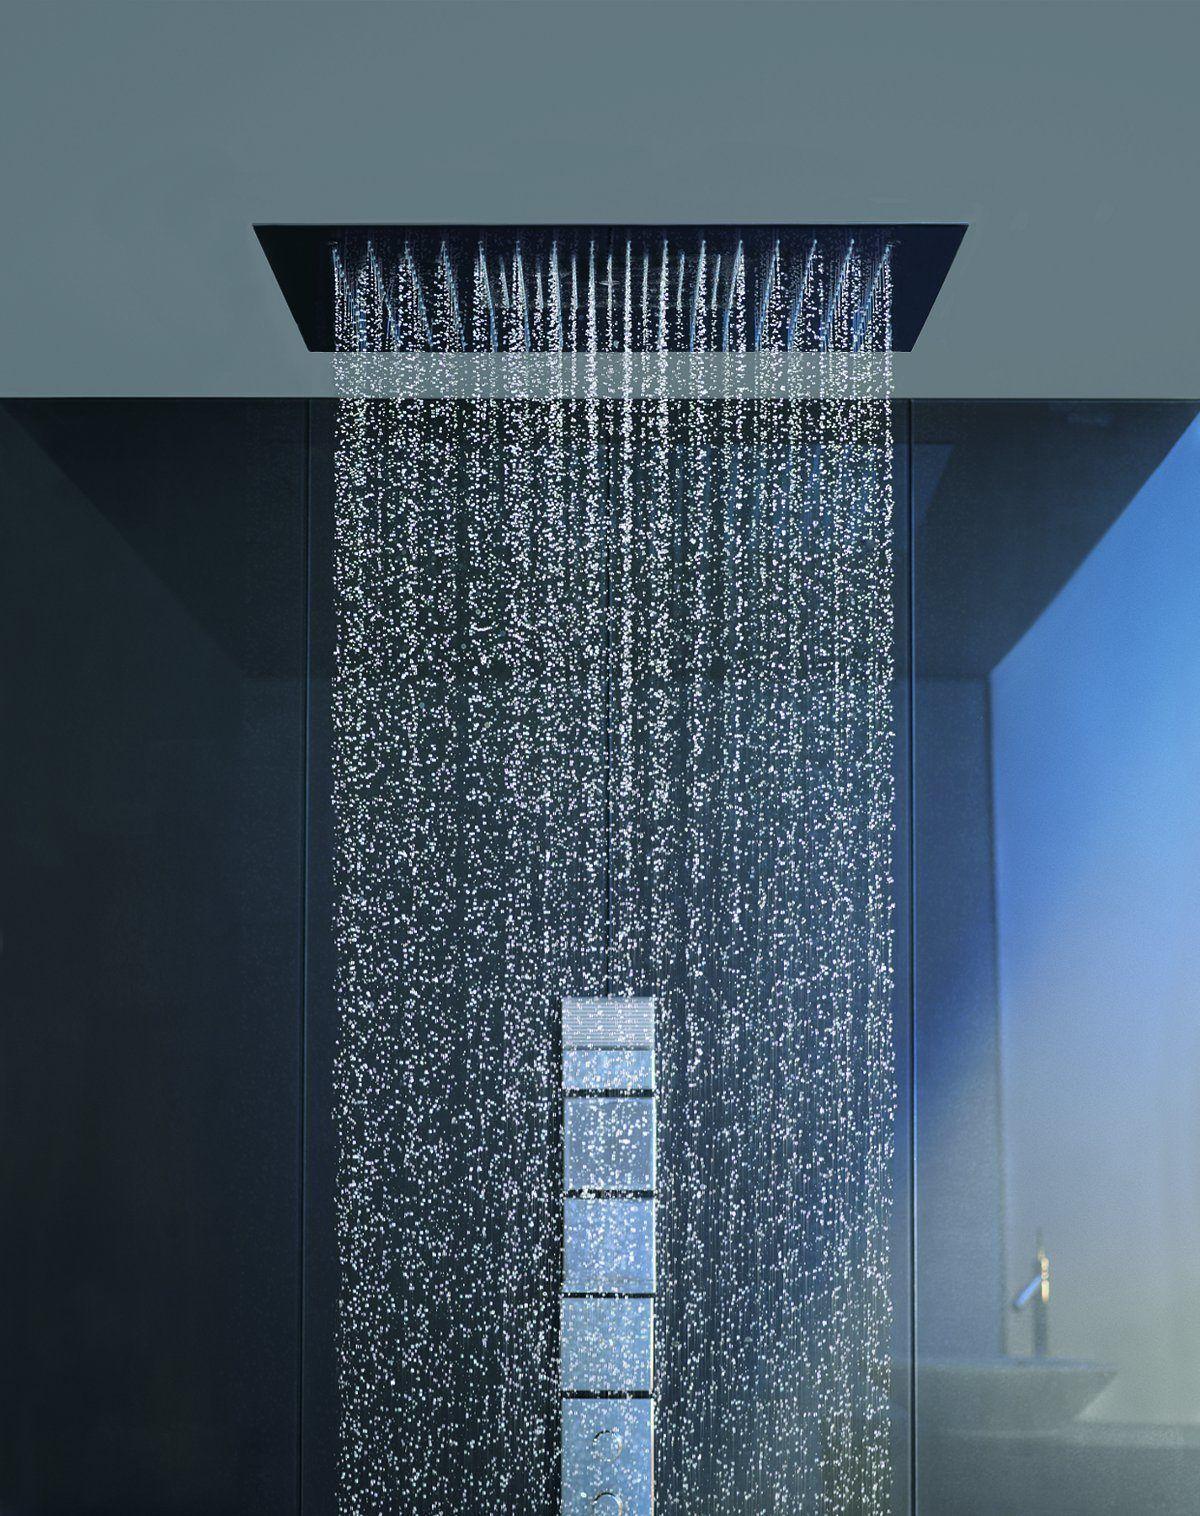 Pscbath Luxury Plumbing Fixtures Led Shower Head Shower Heads Modern Shower Design